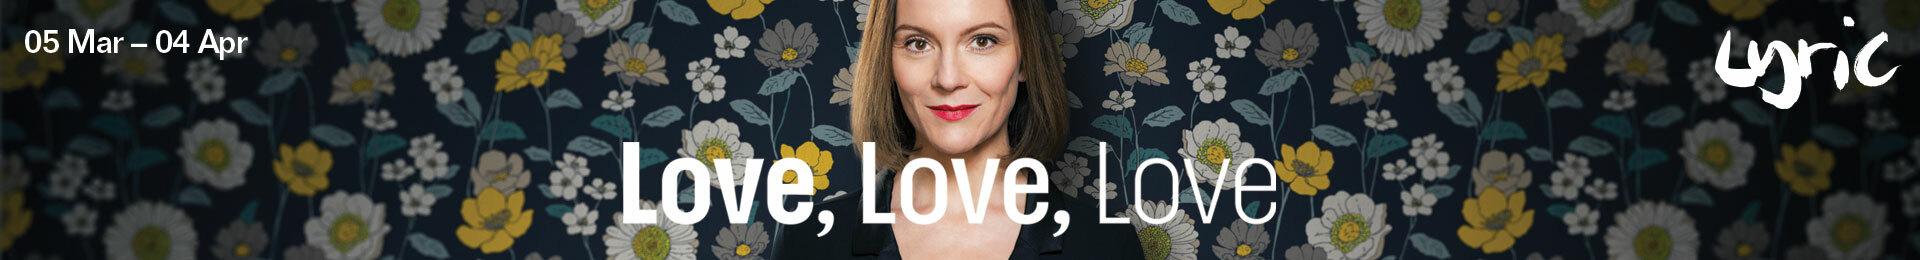 Love, Love, Love banner image